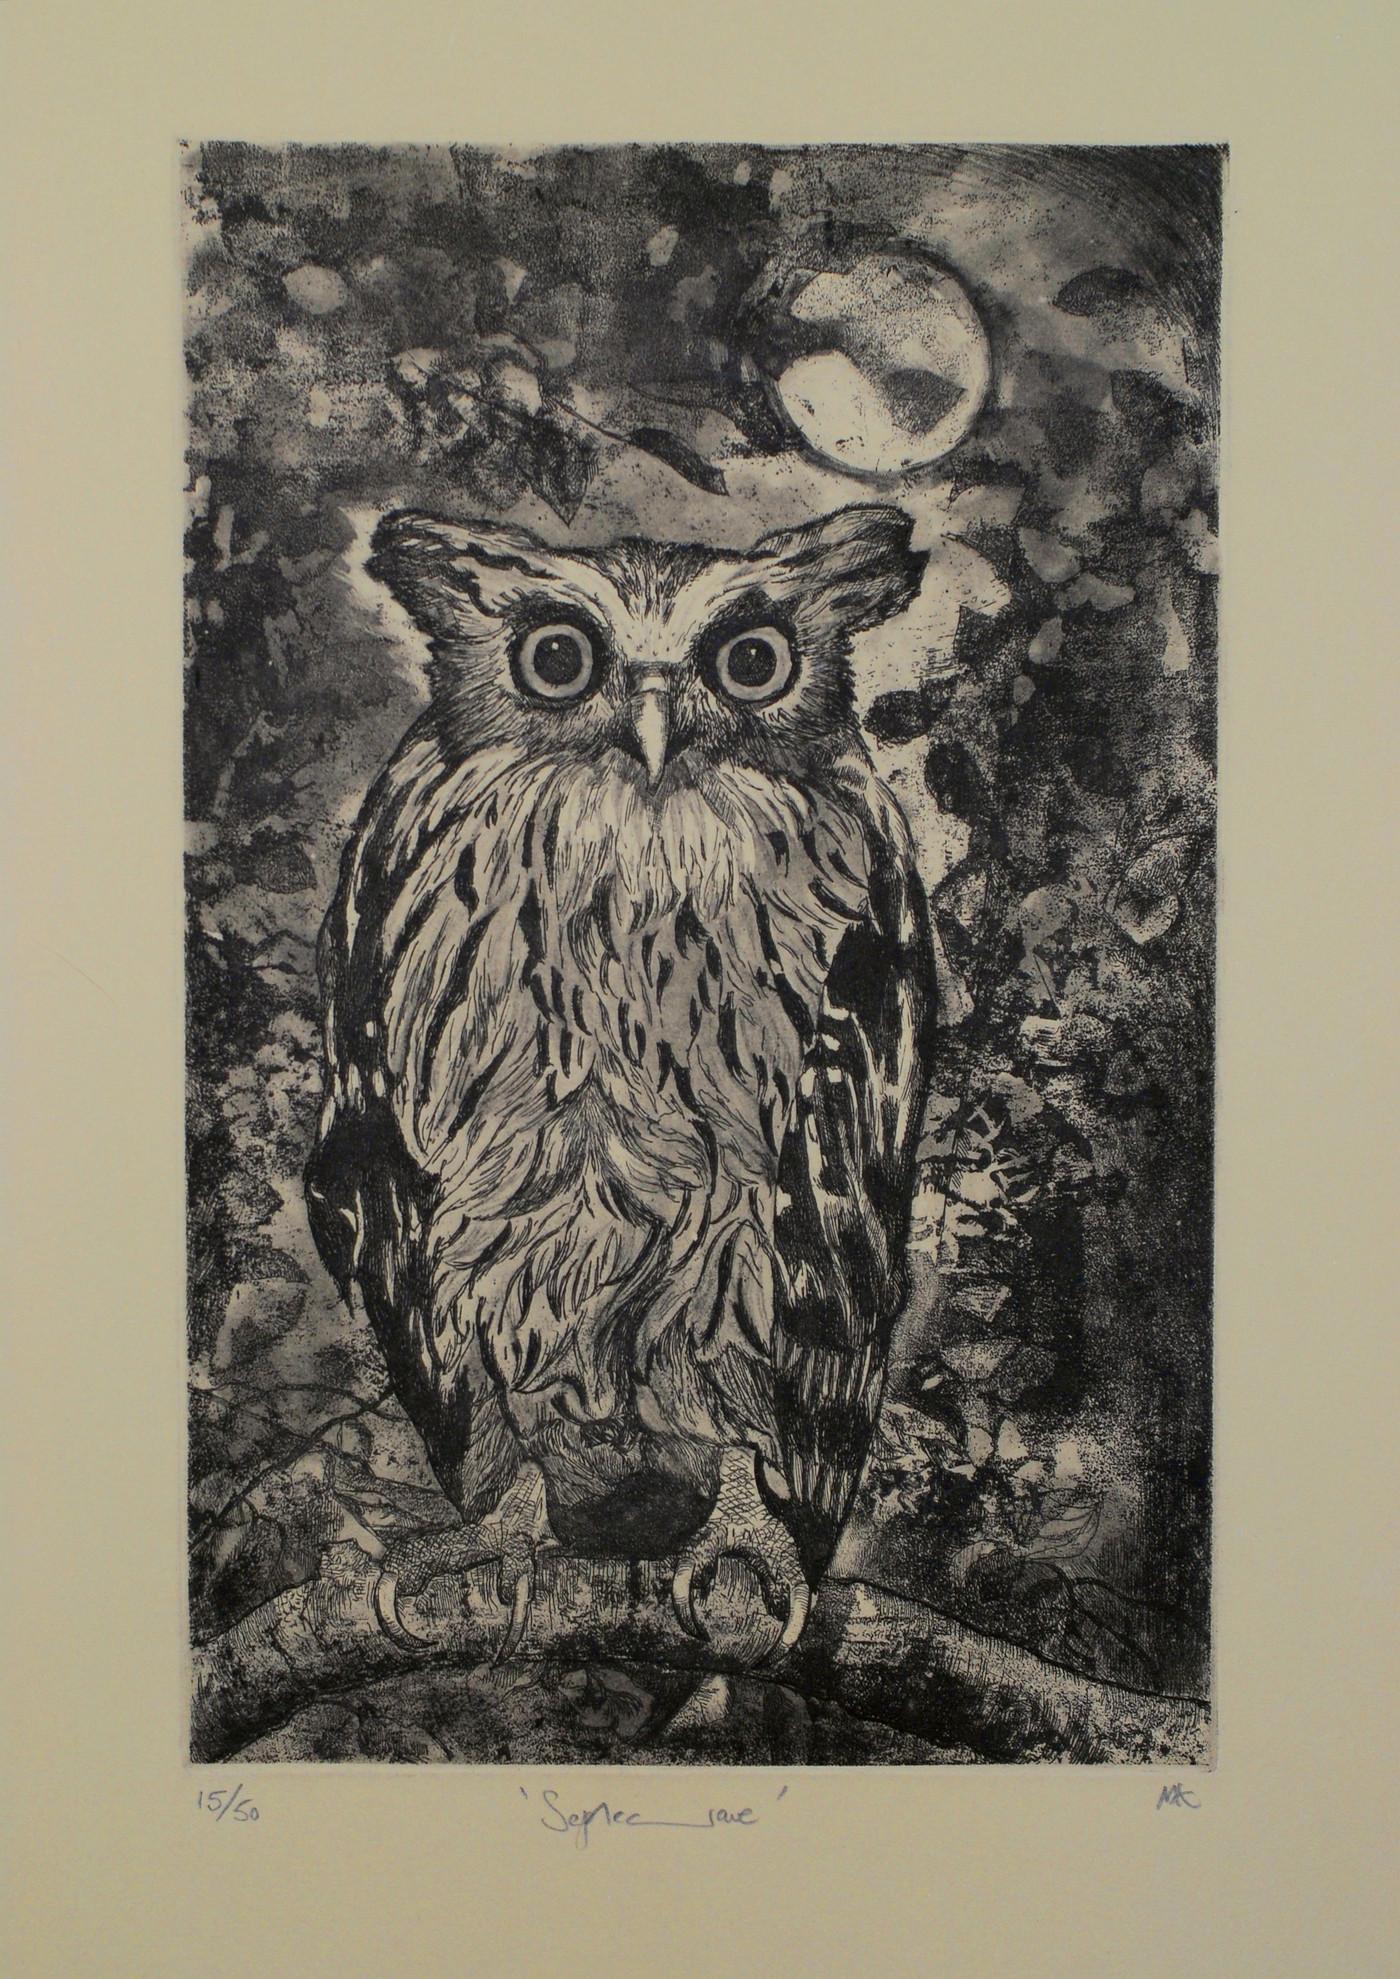 Eagle Owl Etching